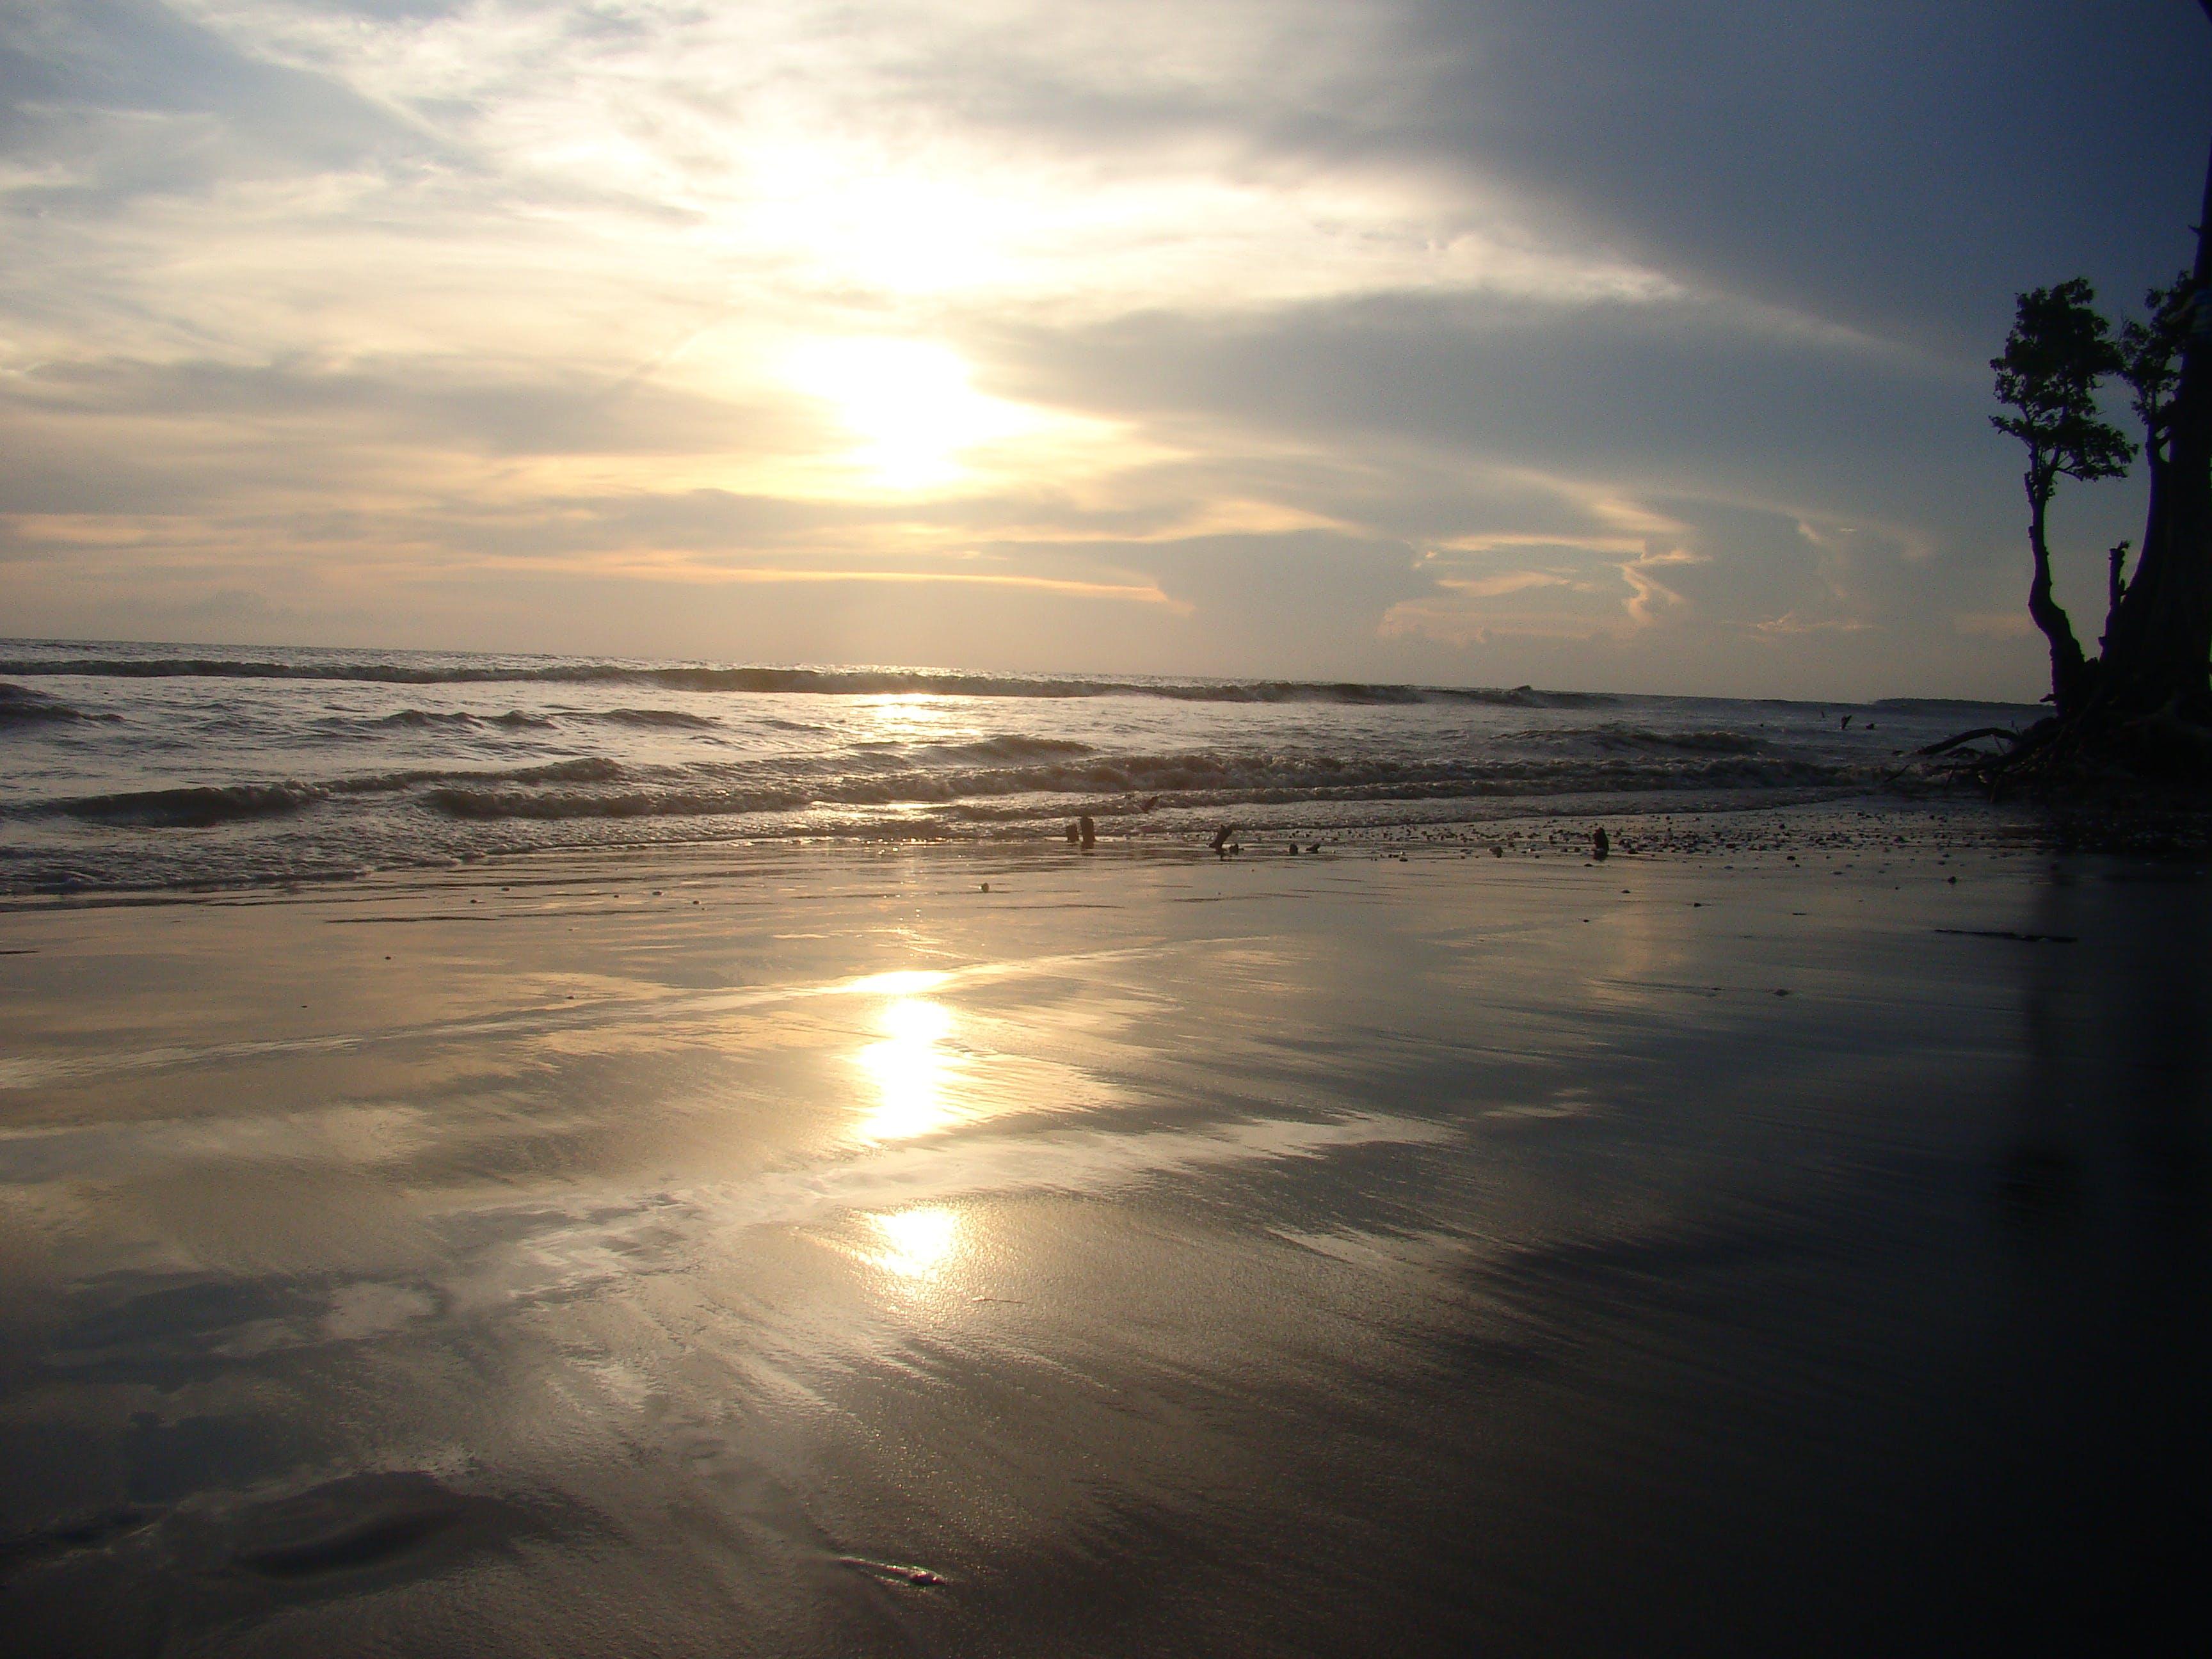 Free stock photo of beach, ocean, sunset, texture